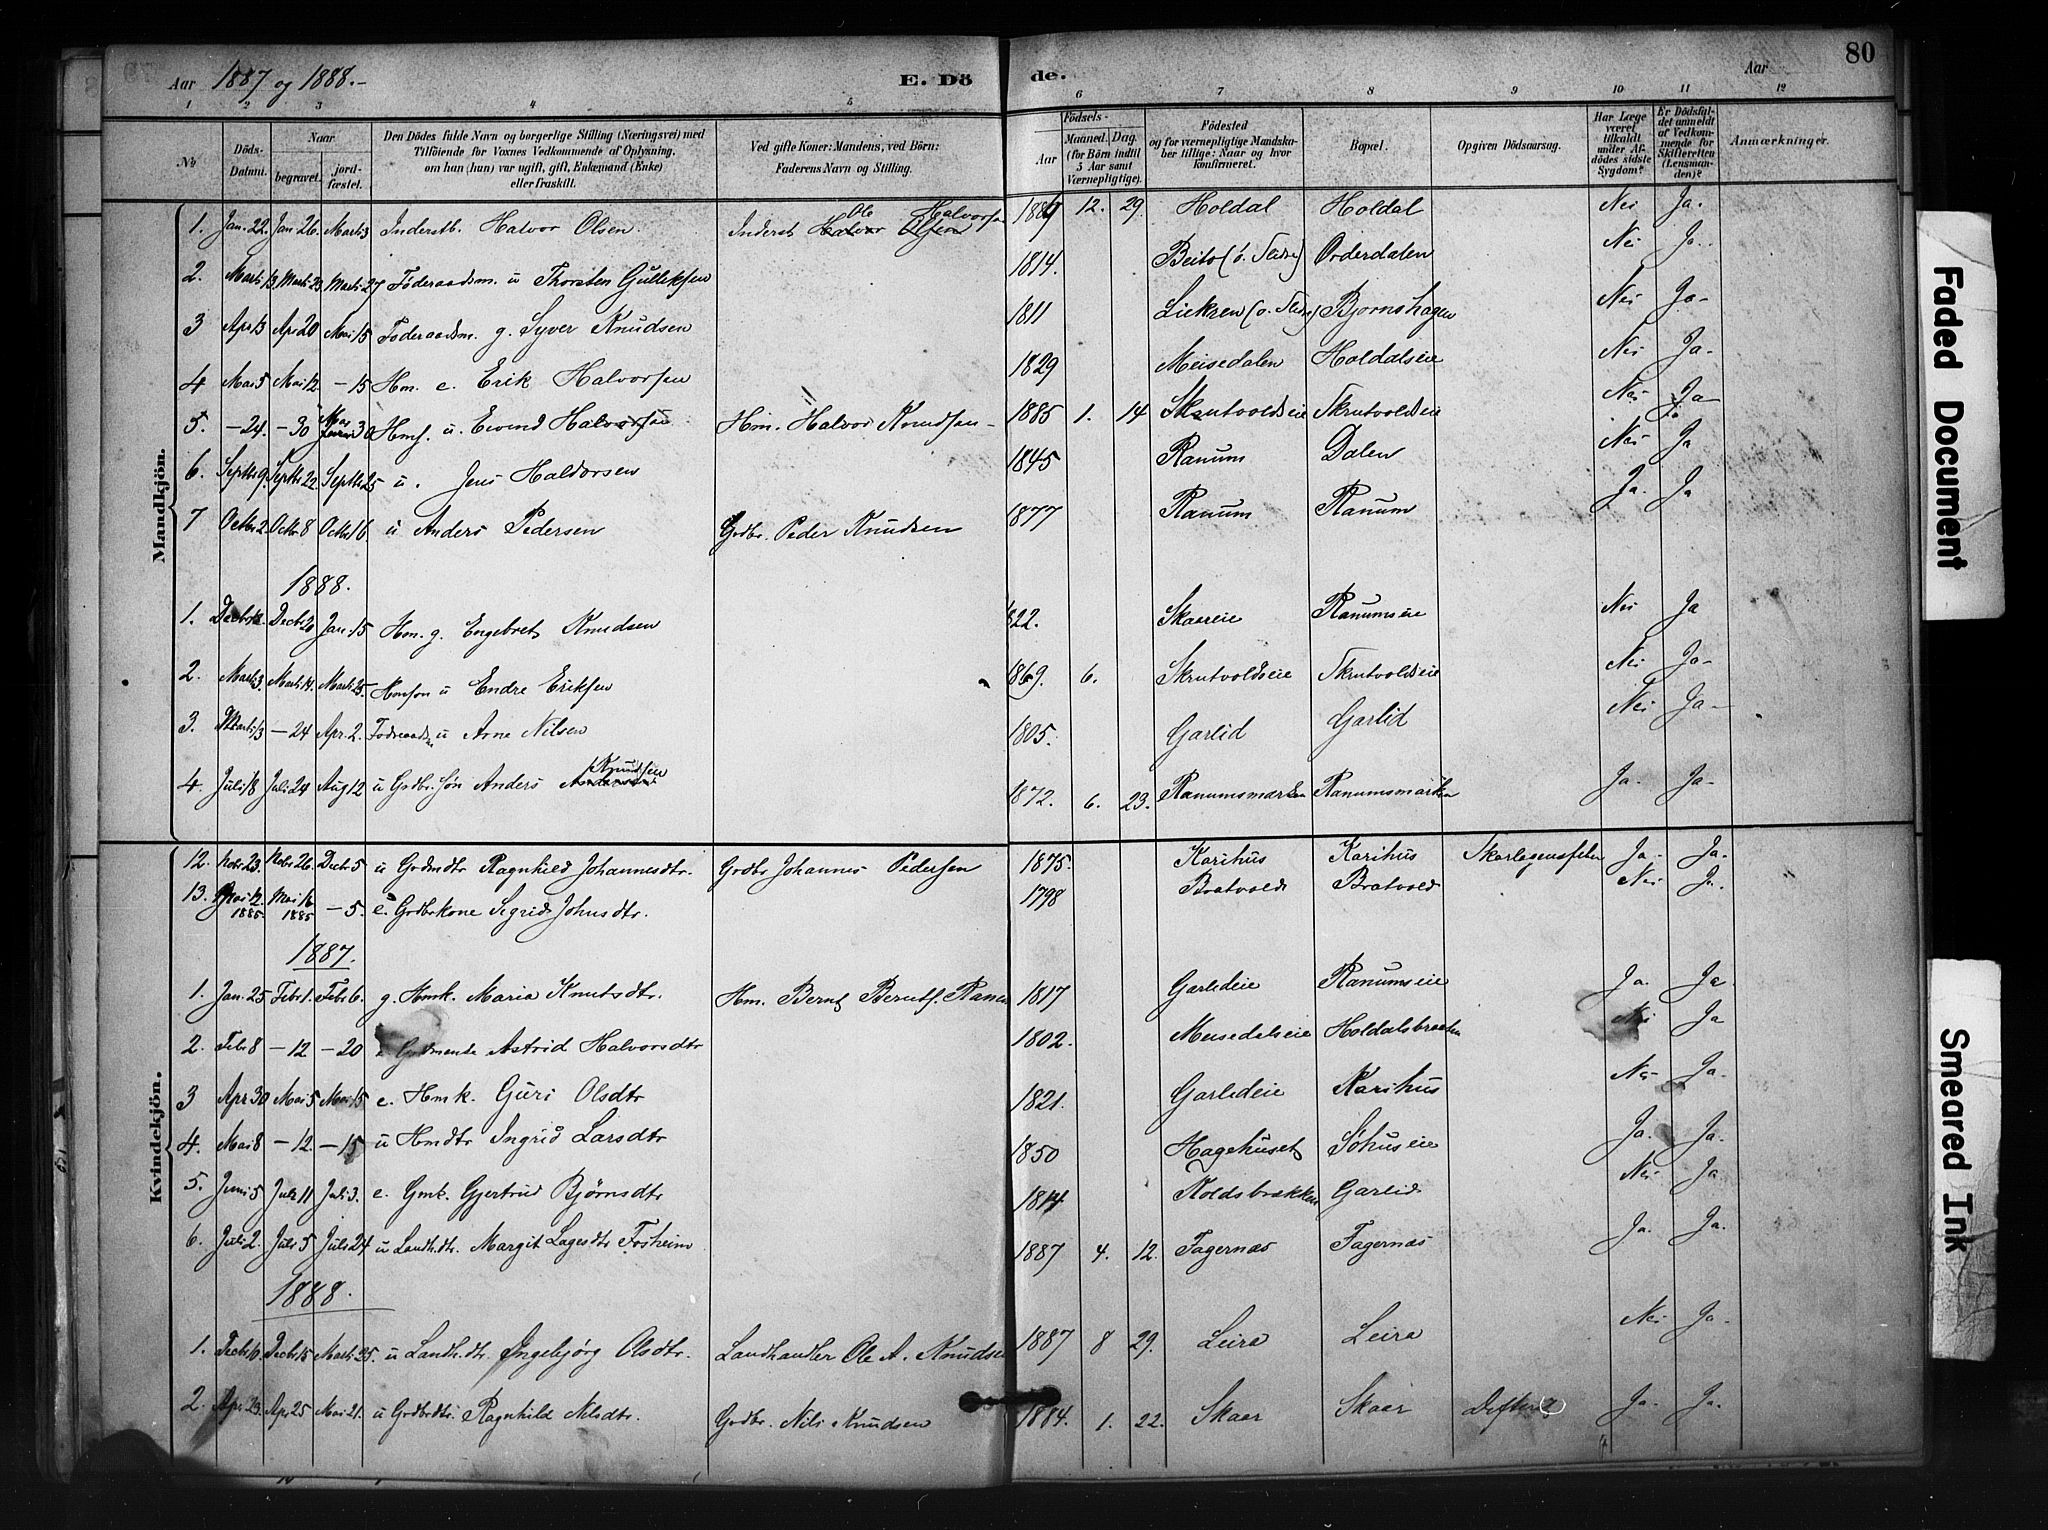 SAH, Nord-Aurdal prestekontor, Ministerialbok nr. 12, 1883-1895, s. 80